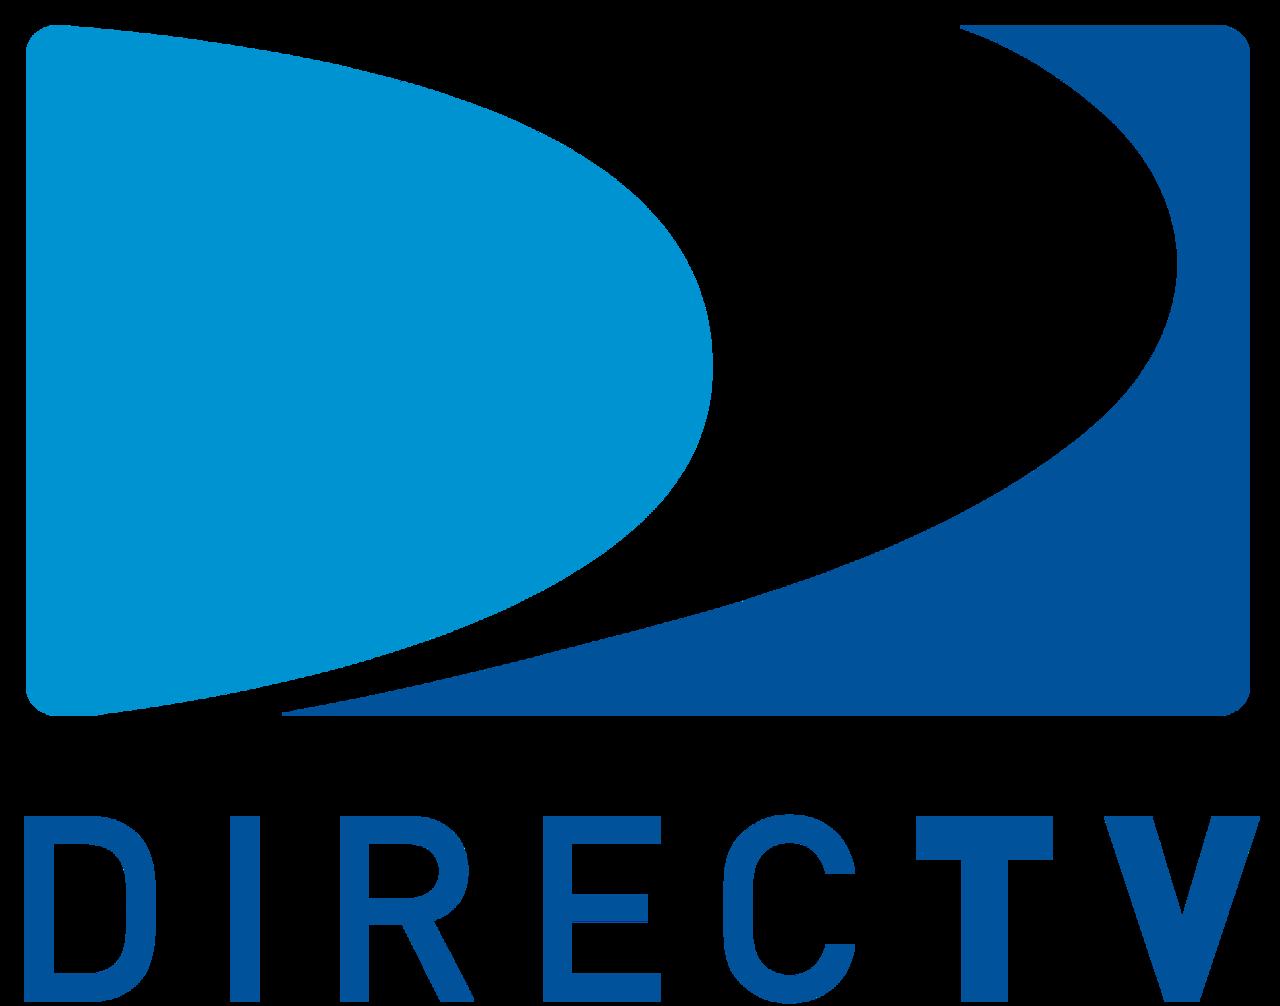 1280px-The_DirecTV_logo